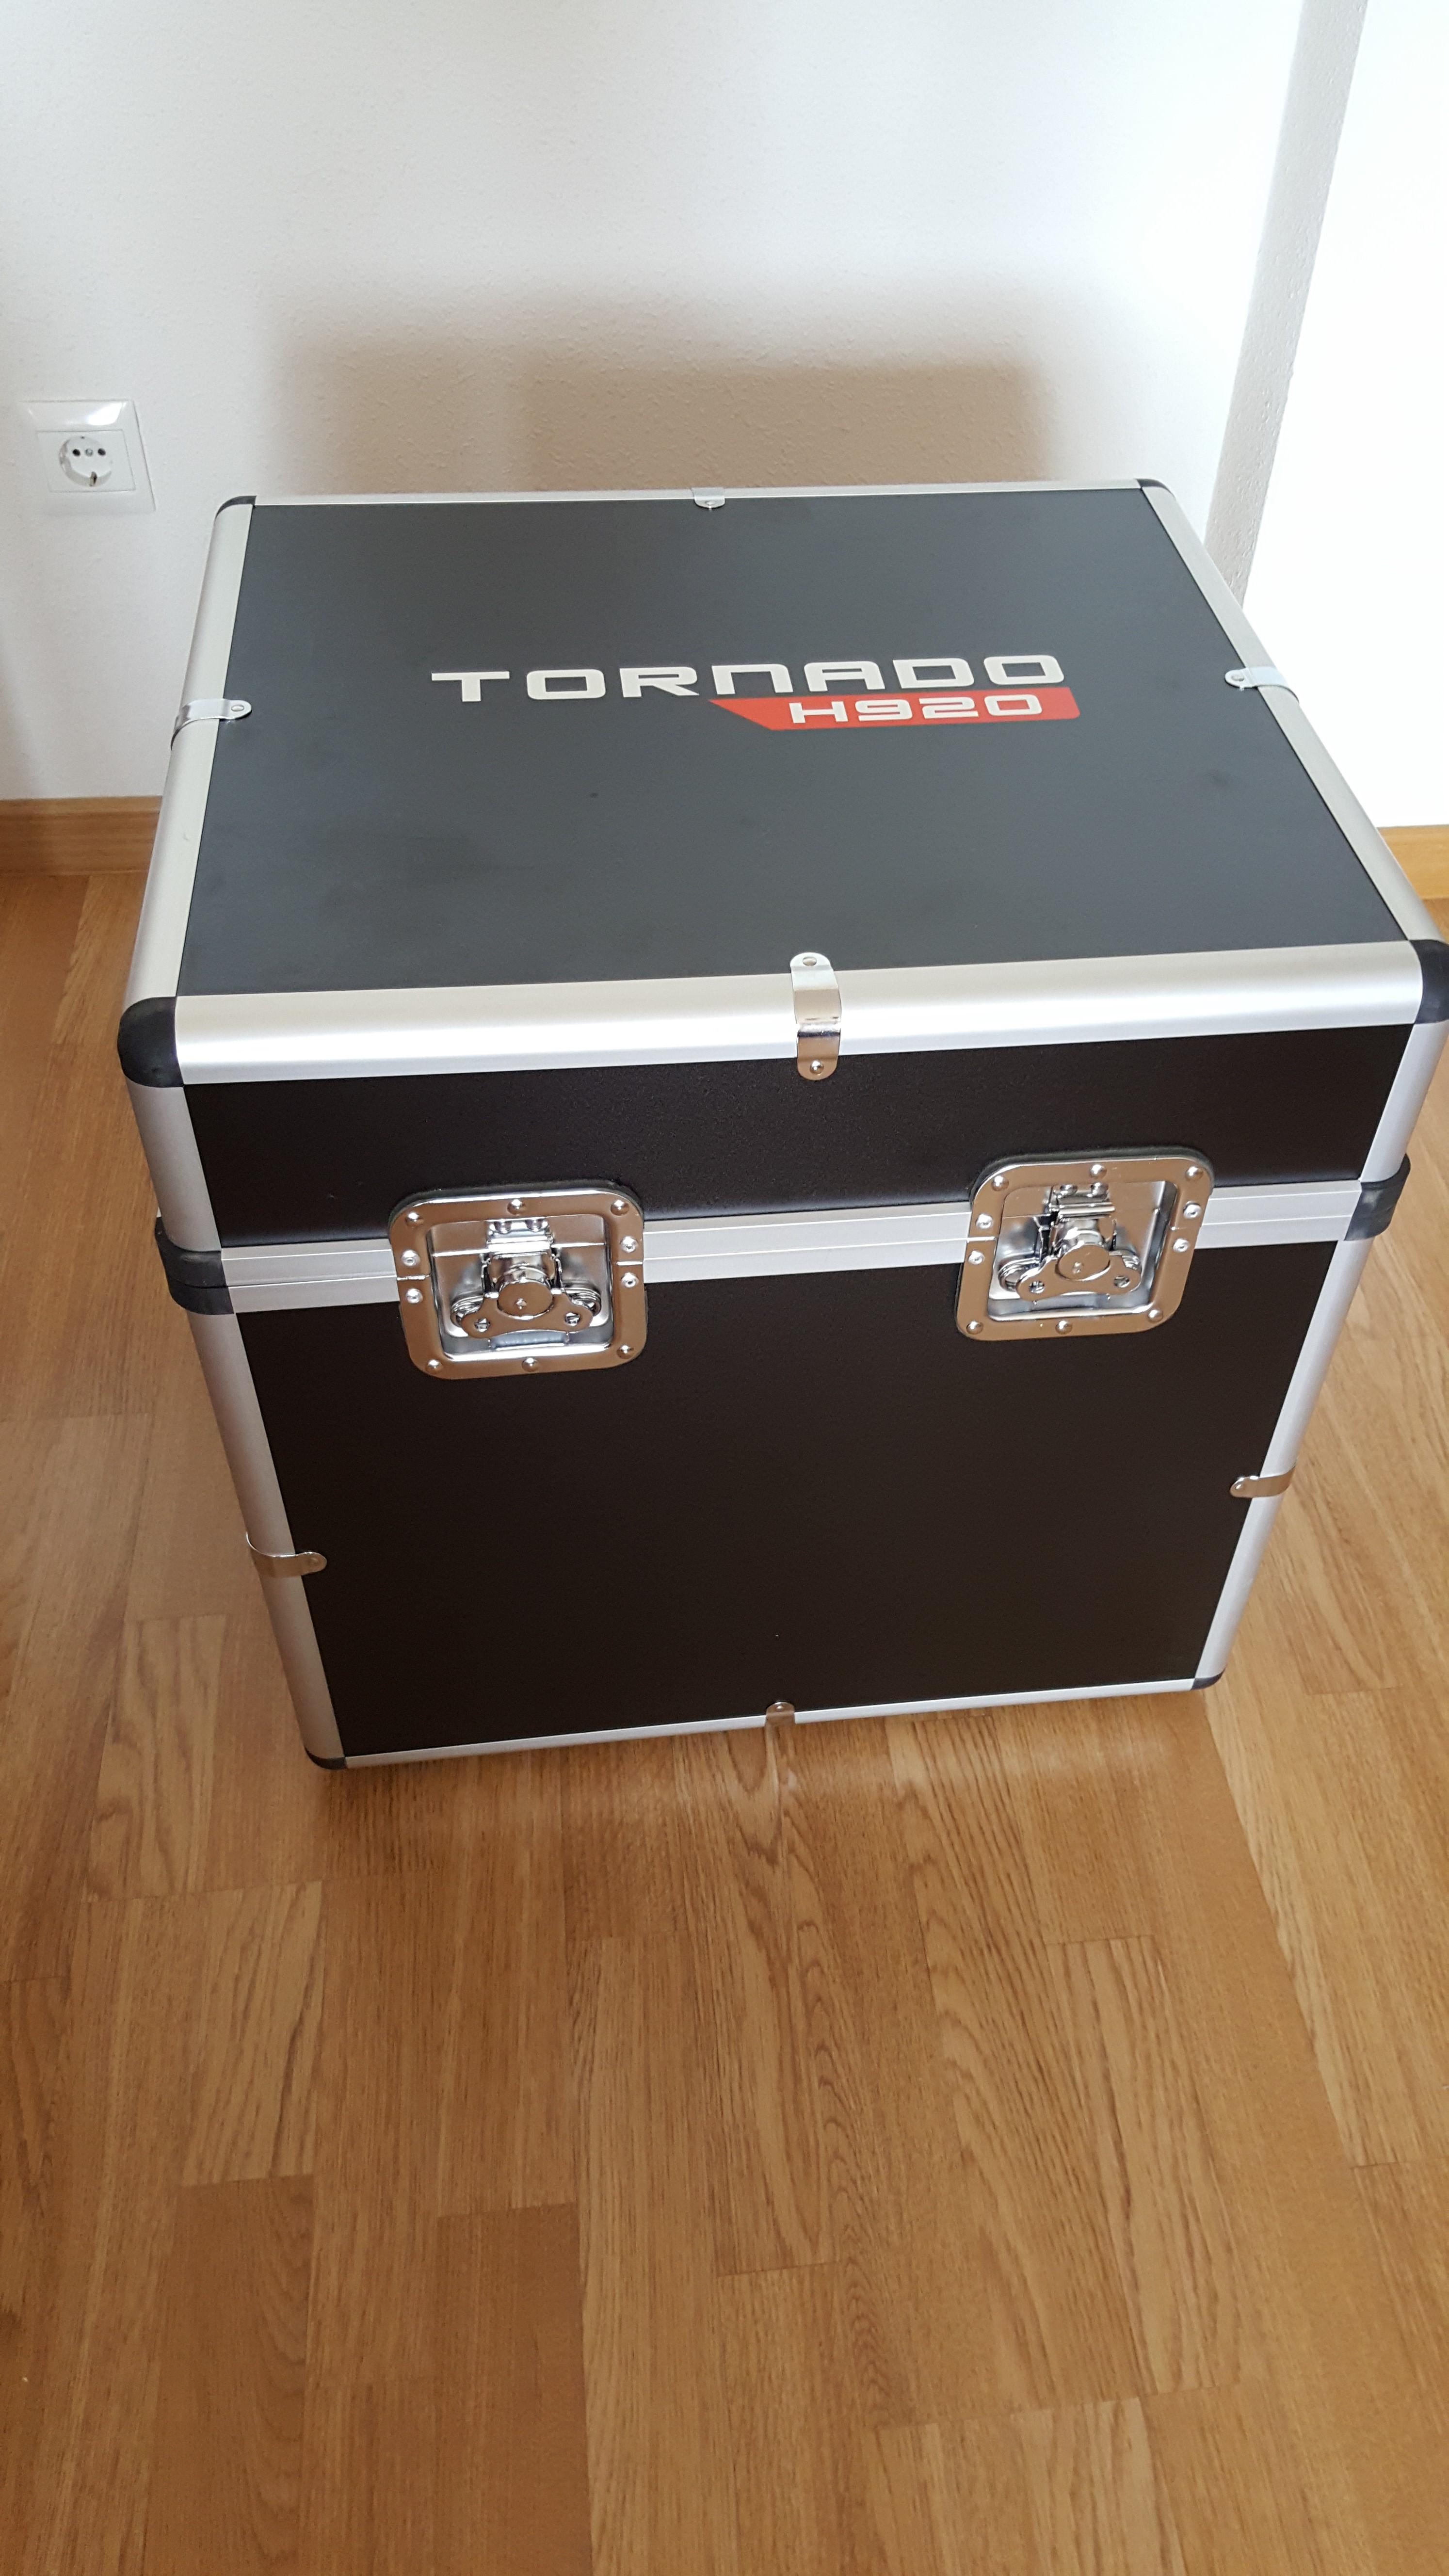 Maleta transporte Tornado H920